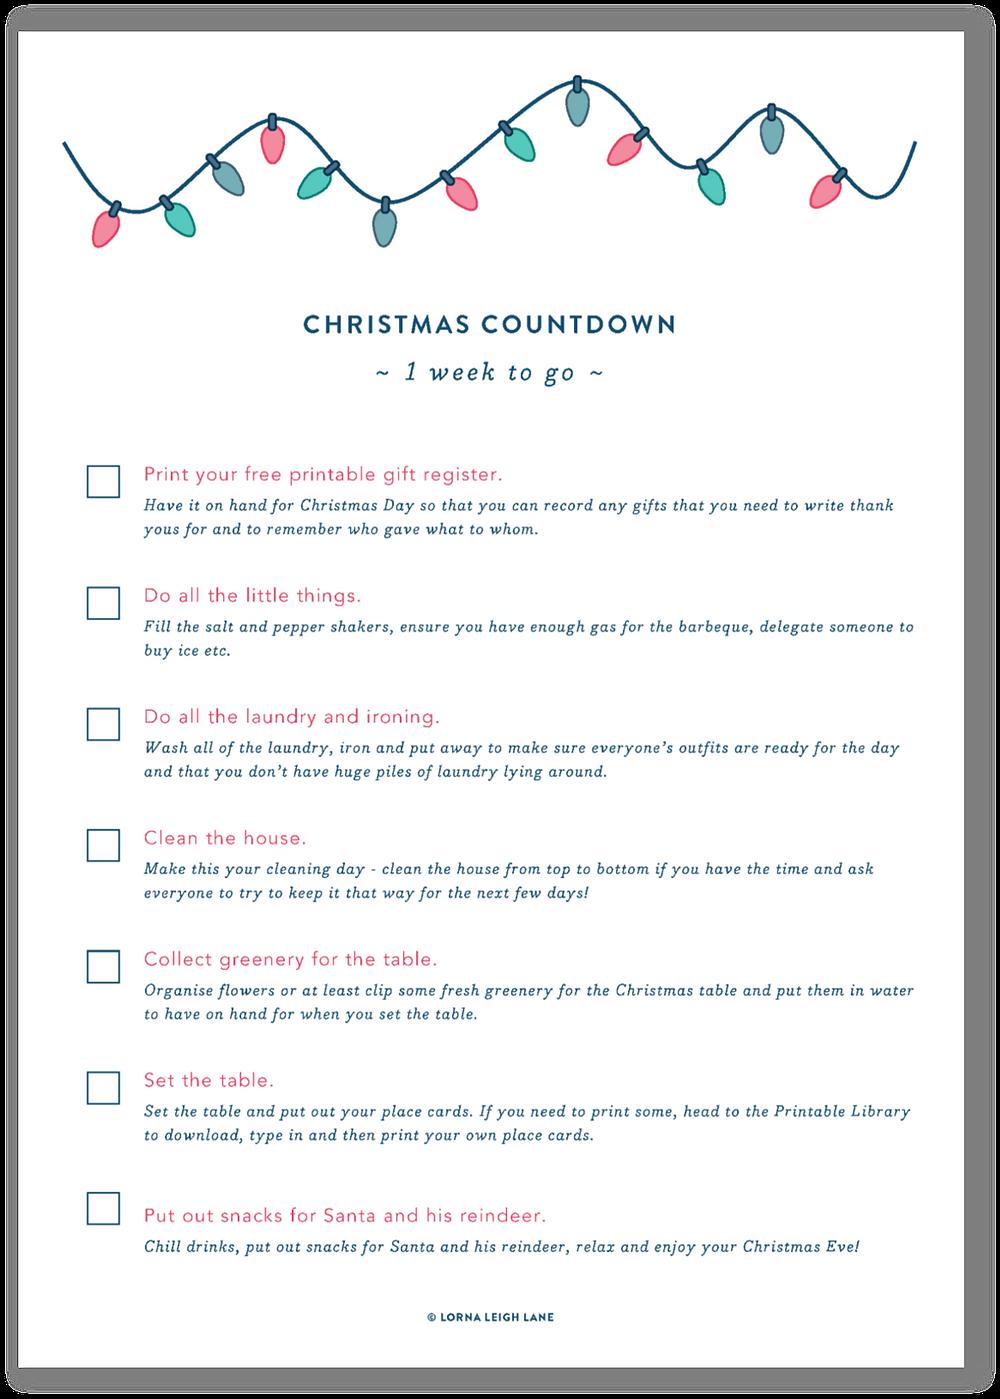 Christmas Countdown - 1 week to go